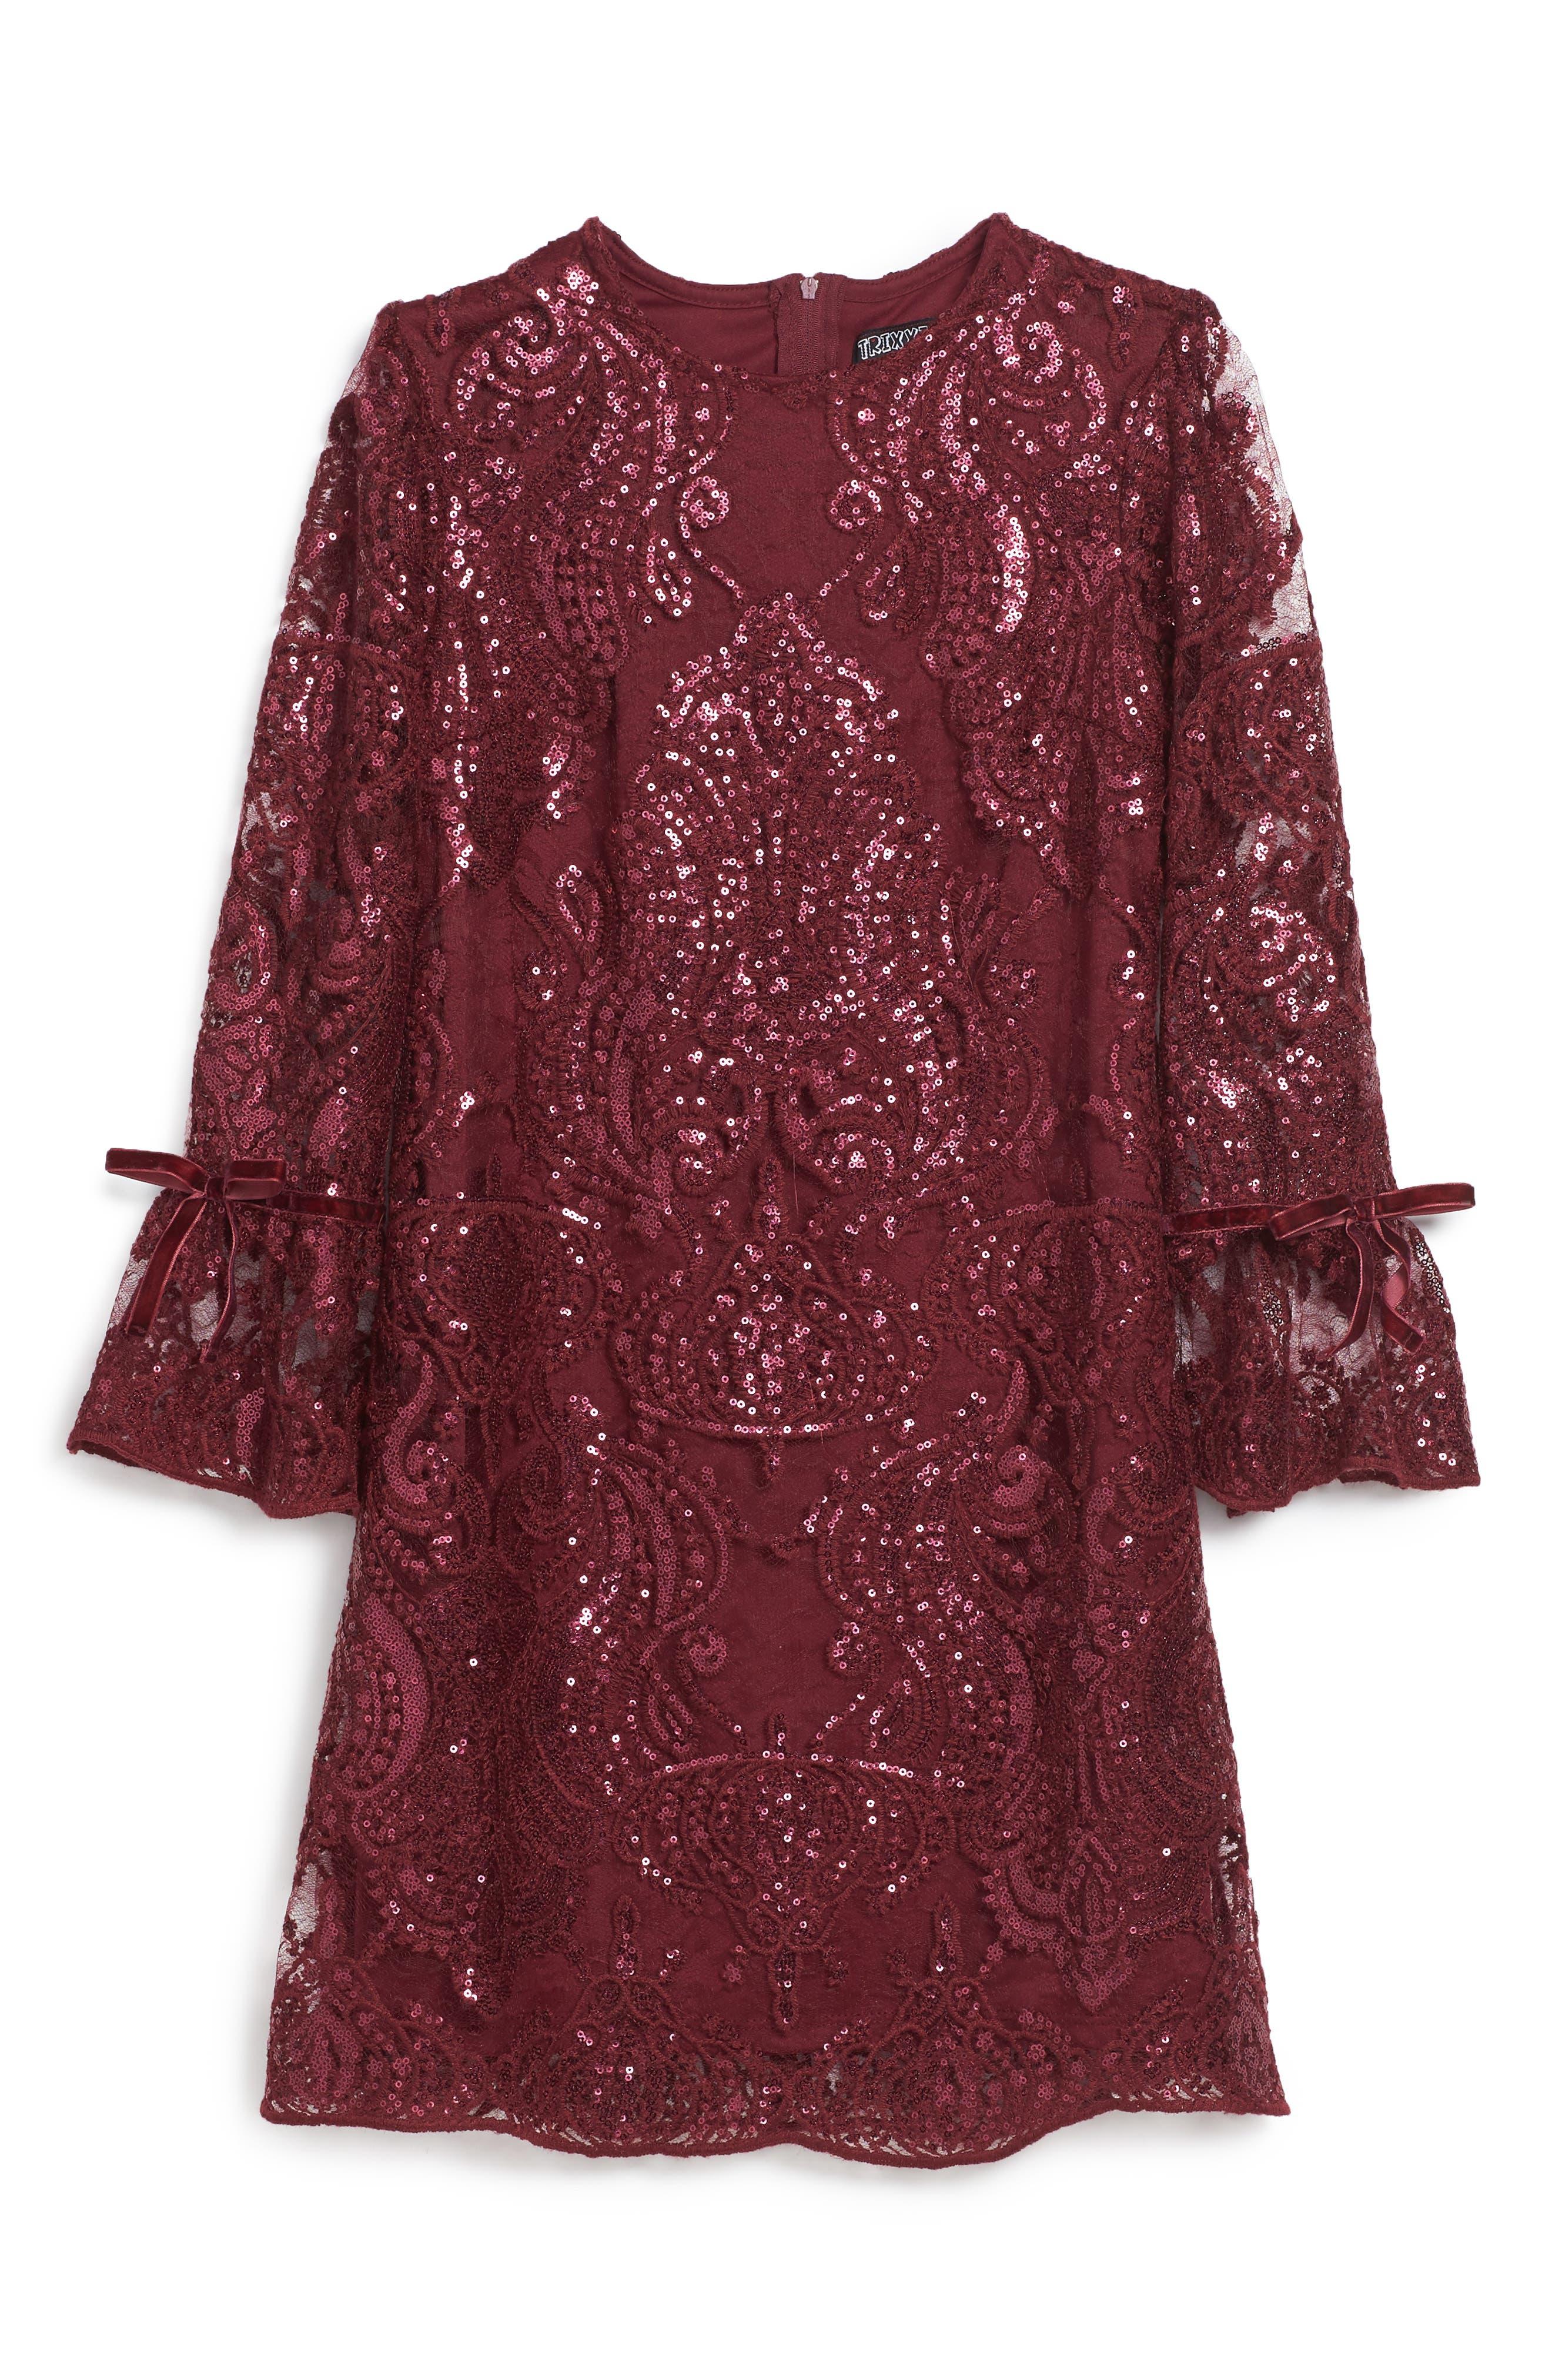 Scalloped Sequin Embellished Shift Dress,                             Main thumbnail 1, color,                             600